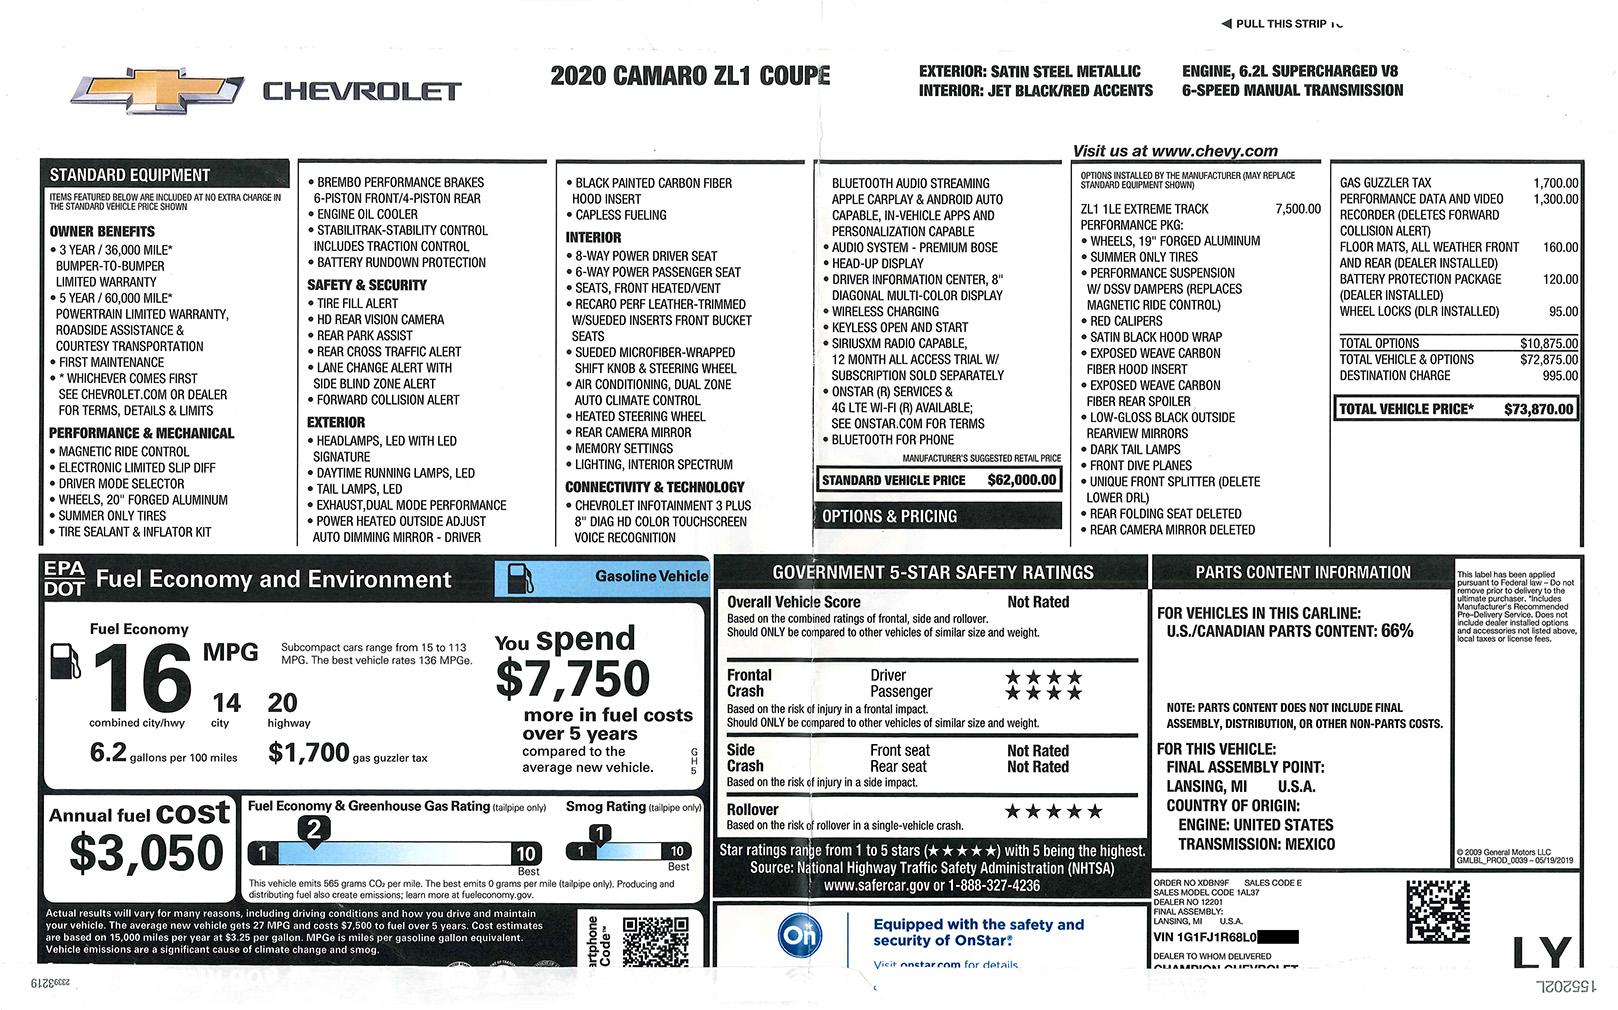 2020 Camaro ZL1